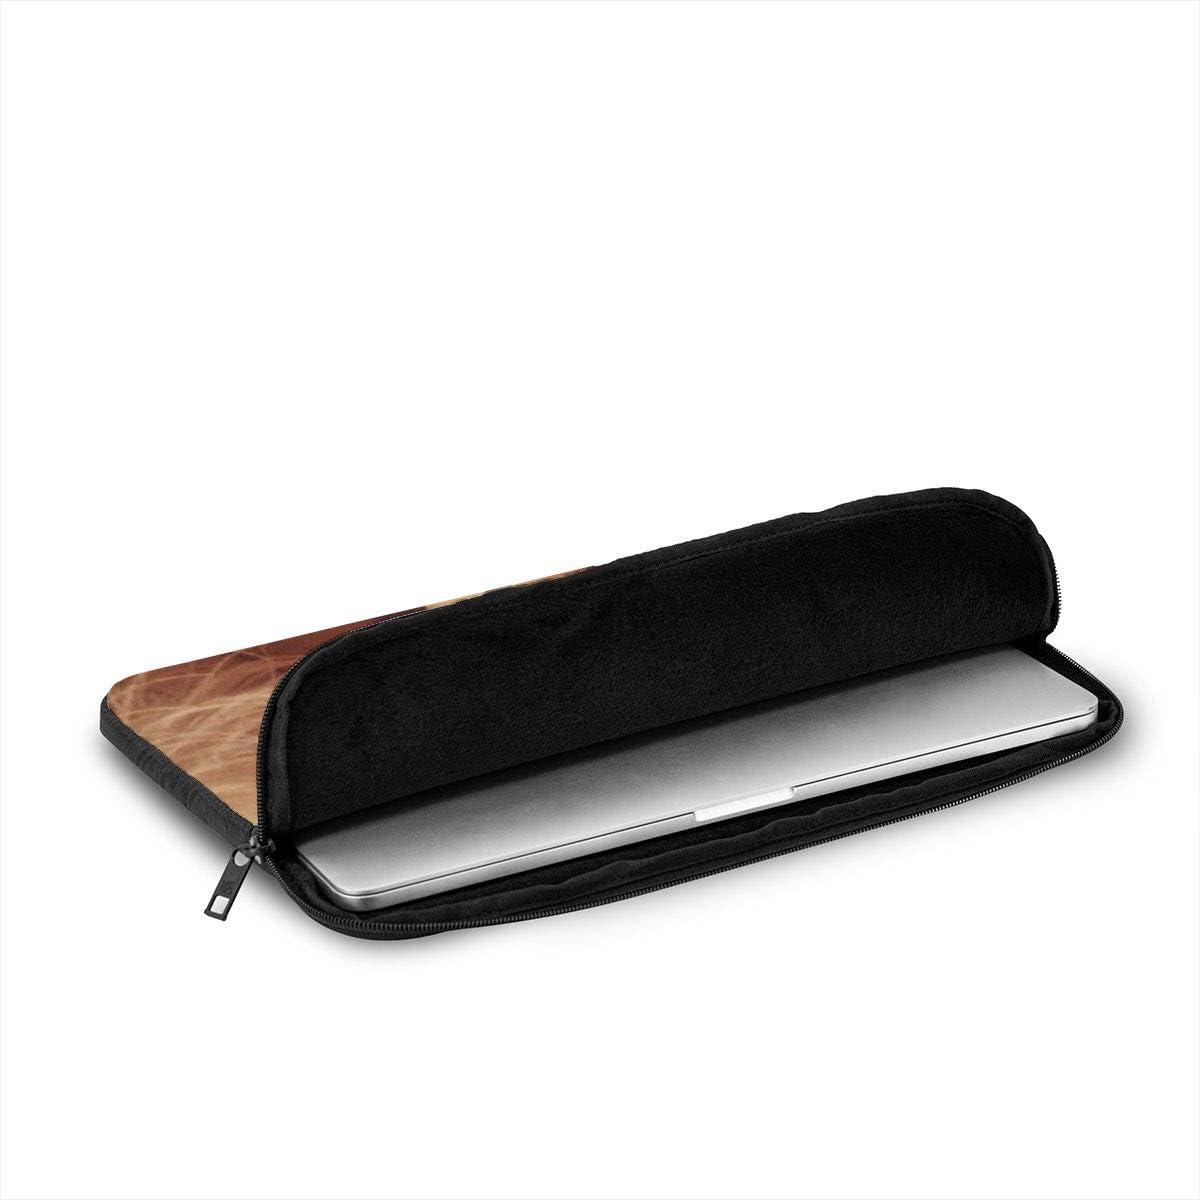 Compatible with Briefcase Tablet Case Black 12 Inch Aoligei La-Na Del-Rey 3D Printing Laptop Case